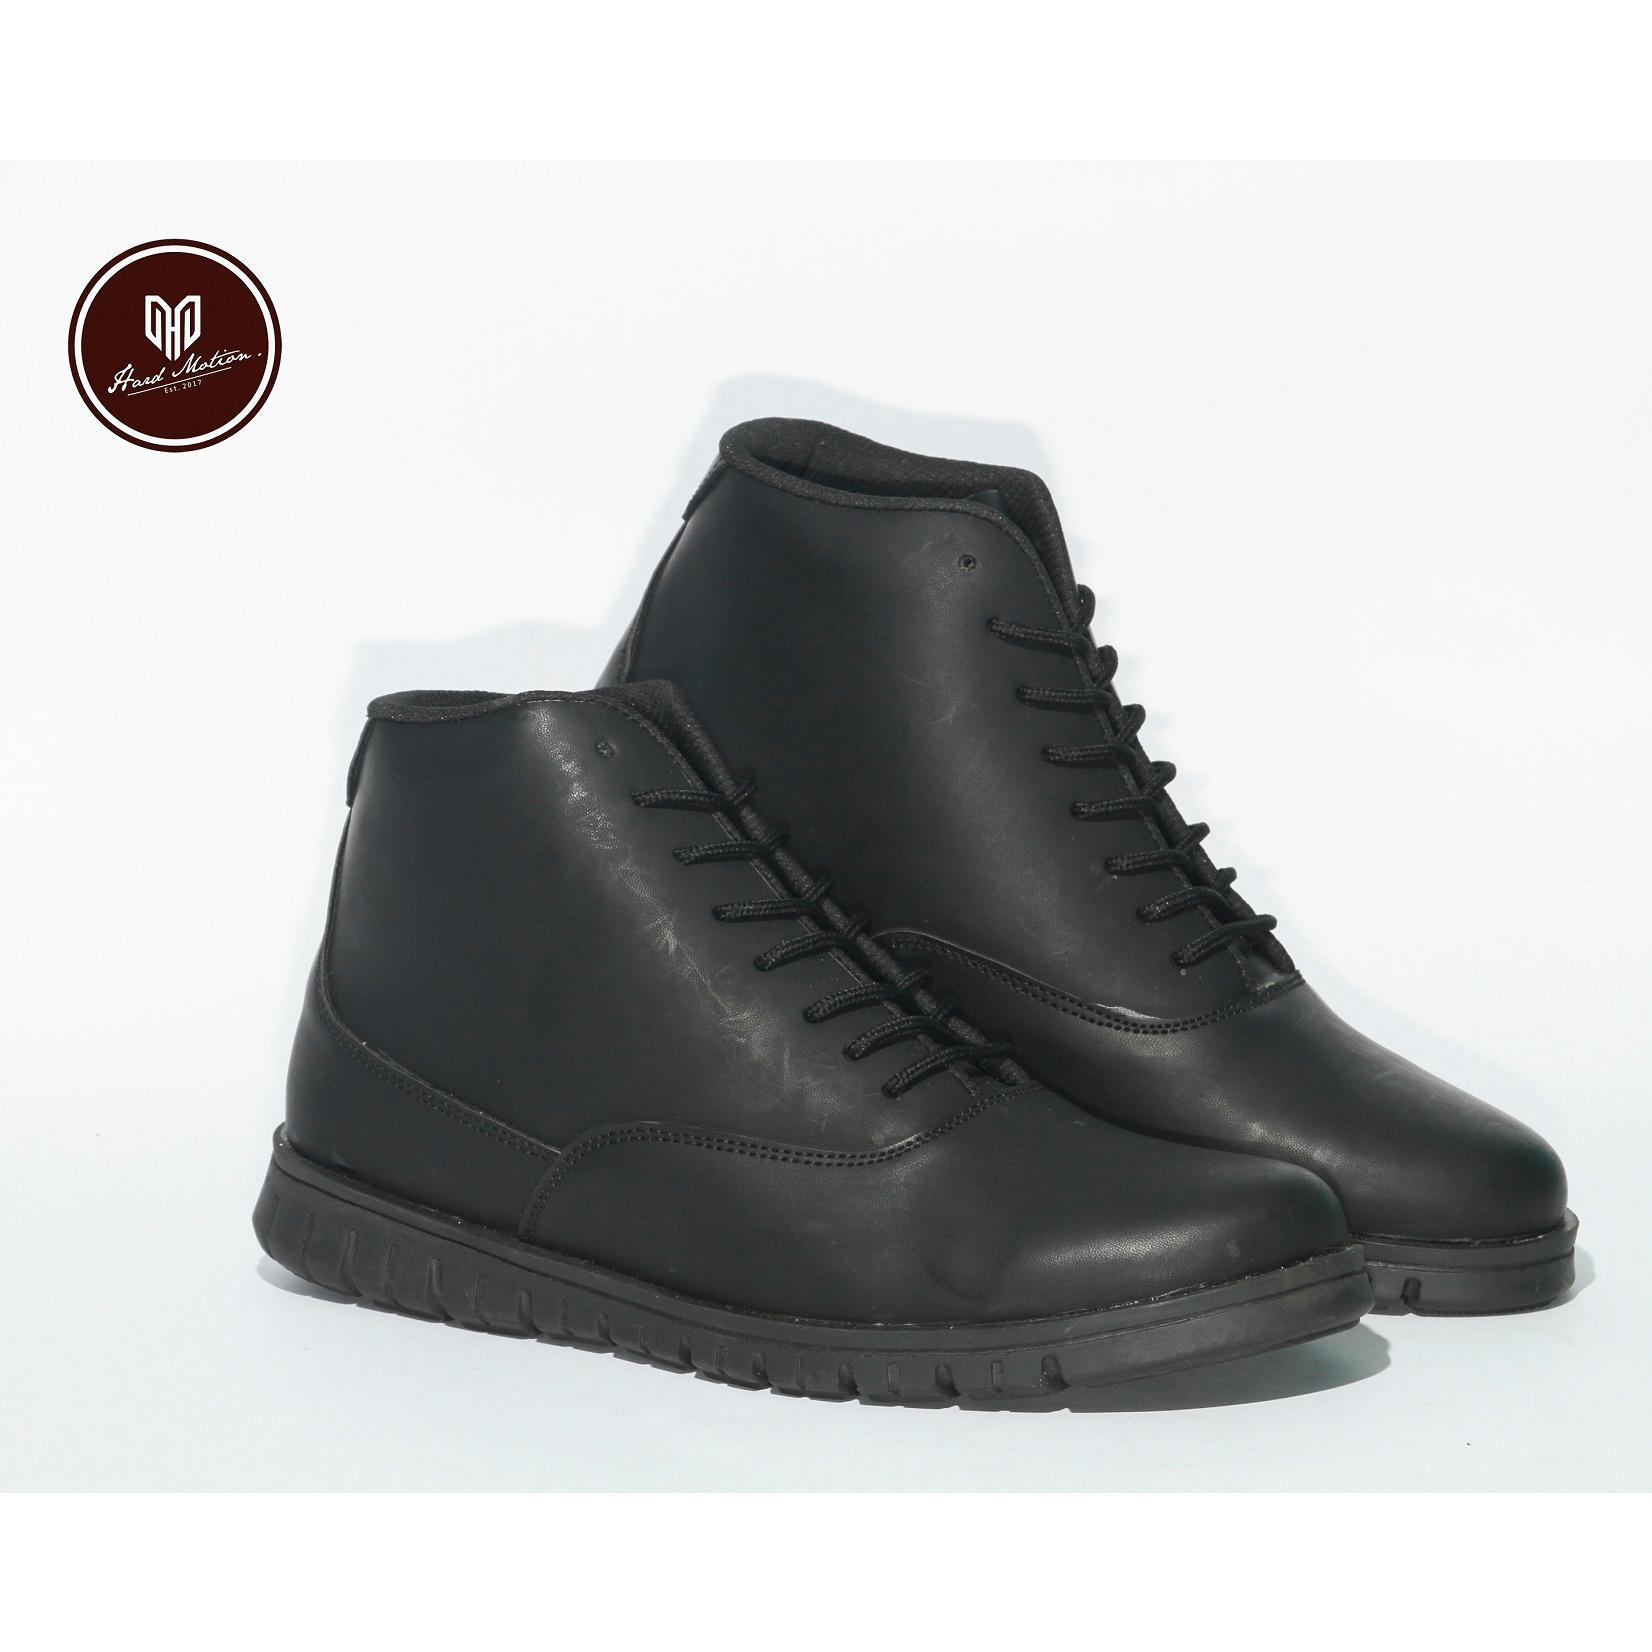 Beli Sepatu Boots Brodo Kulit Asli Pria Branded Best Seller Hard Maroon Ampamp Black Motion Stock Holm Harga Rp 289000